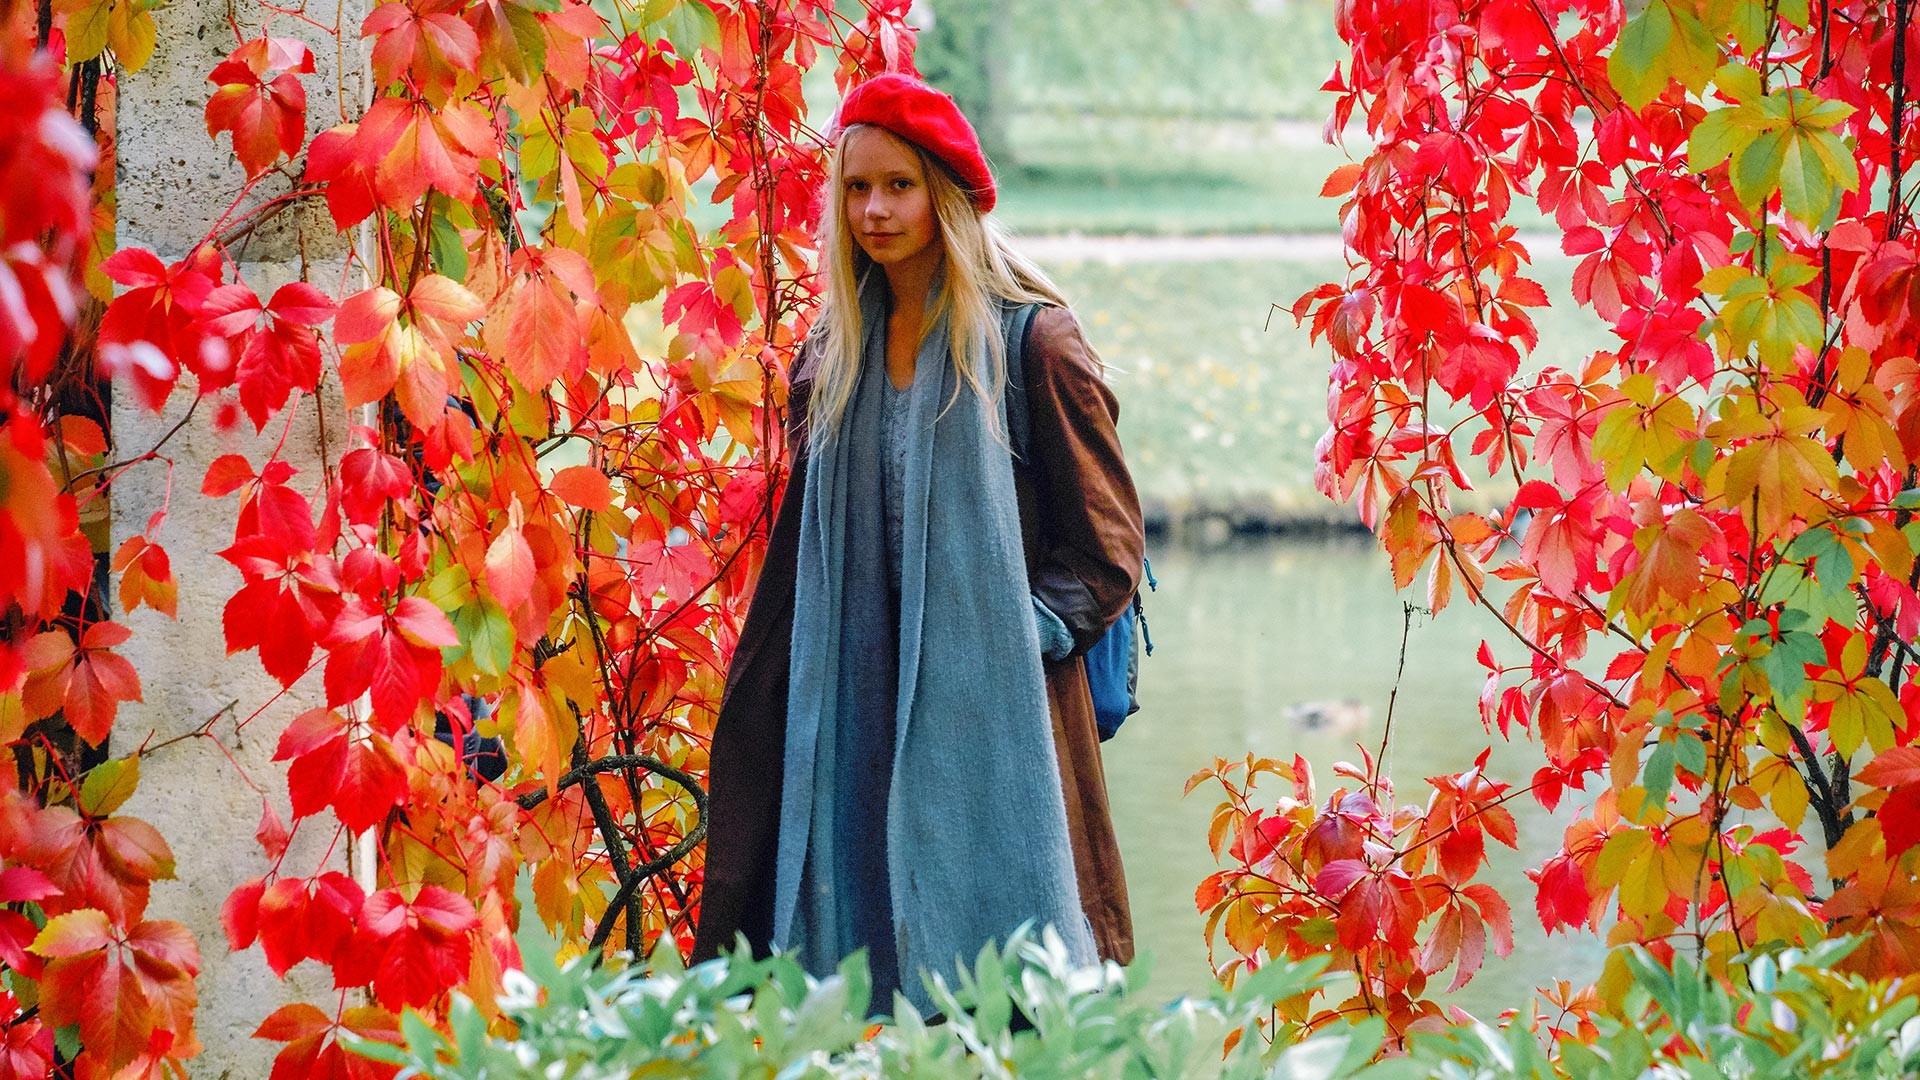 Fall in Oranienbaum, another park in St. Petersburg's suburbs